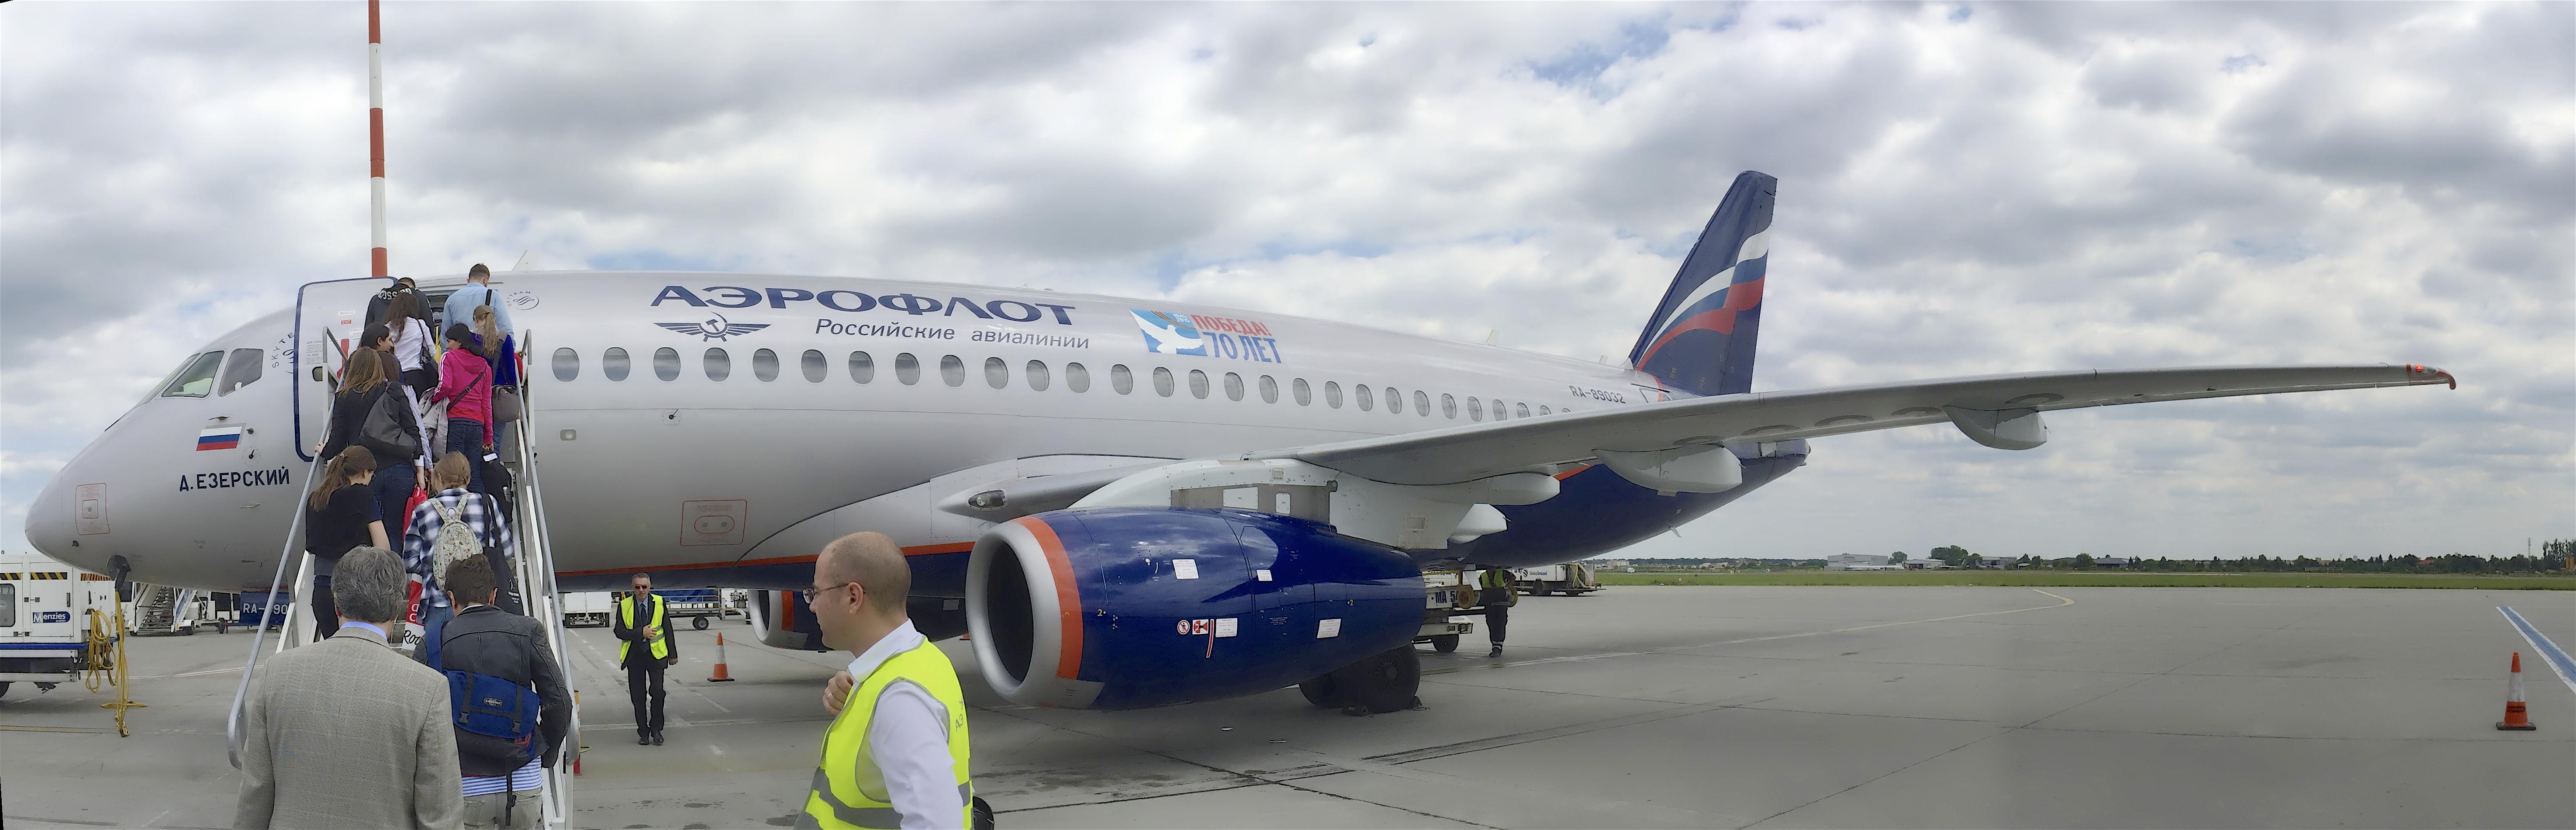 Aeroporto Bucarest : File aeroflot plane otopeni airport bucharest romania une